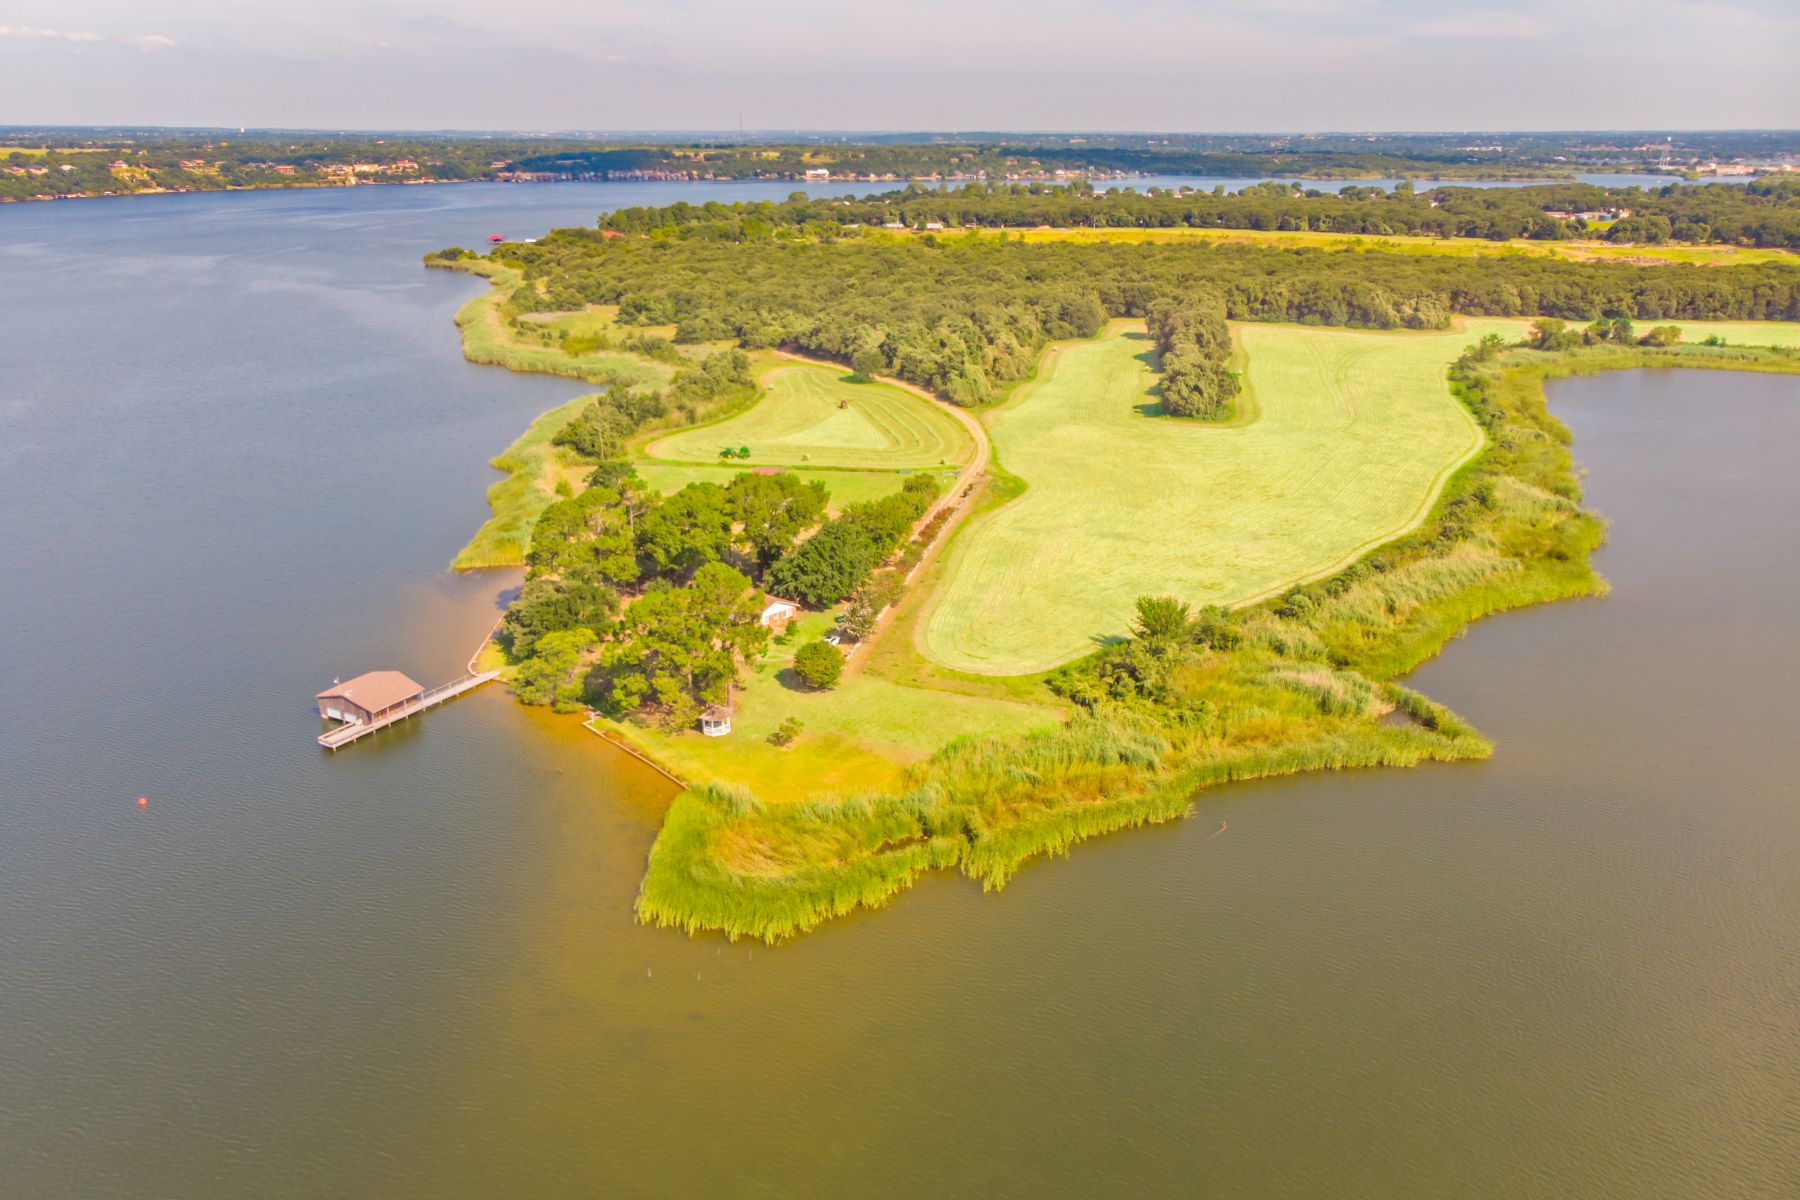 Single Family Homes for Sale at Stunning Lake Granbury Location 6801 John Gee Court Granbury, Texas 76049 United States